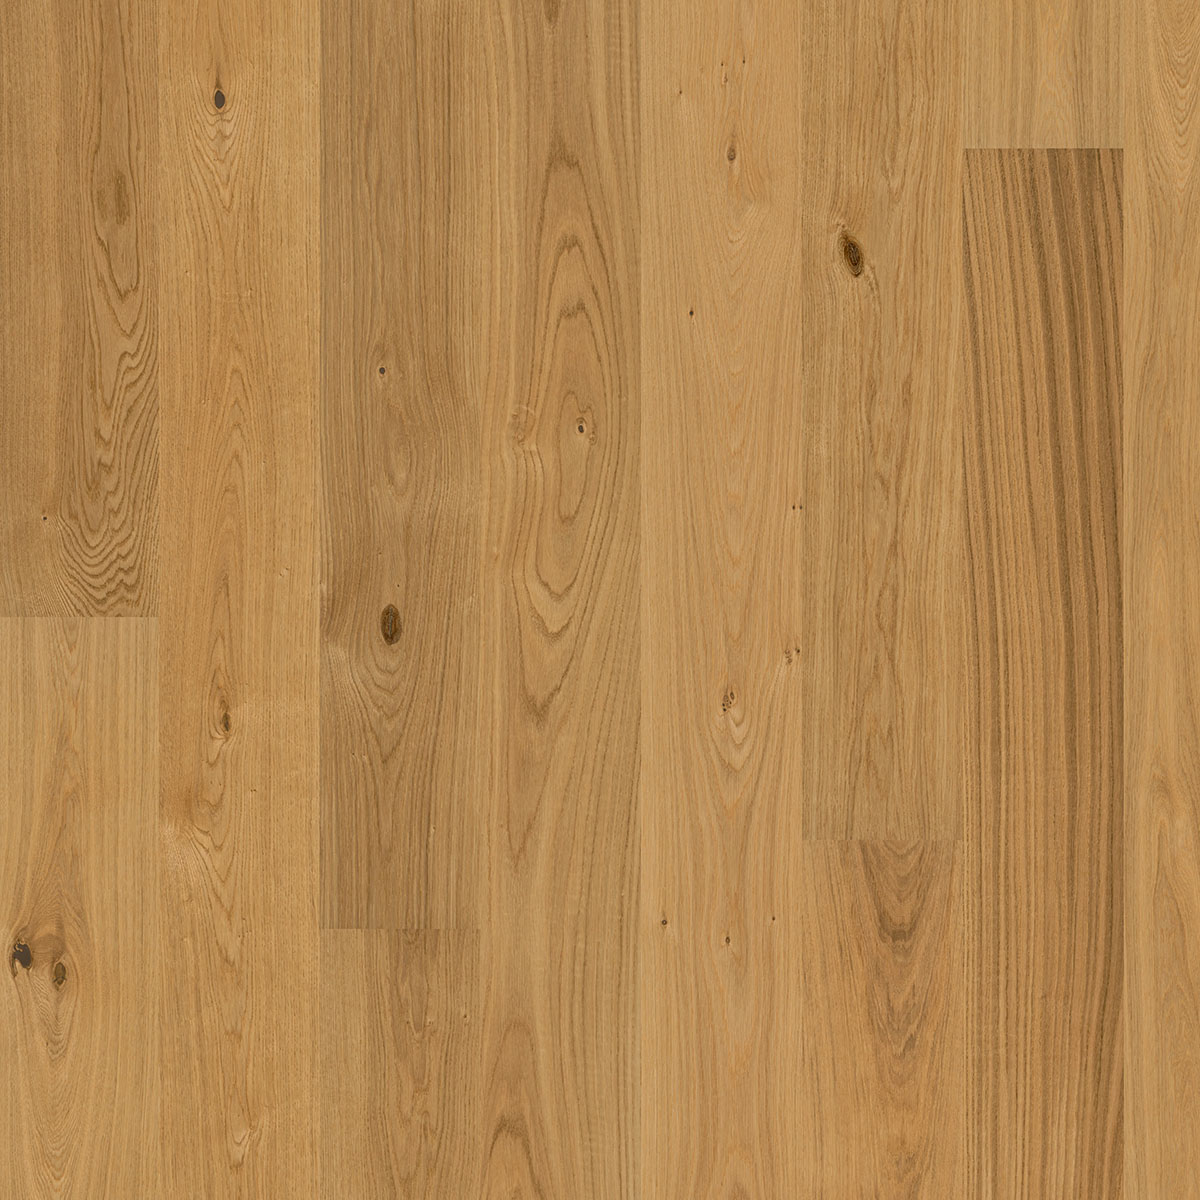 Kährs Ek Pure Mattlack 1-stav - Parkettgolv